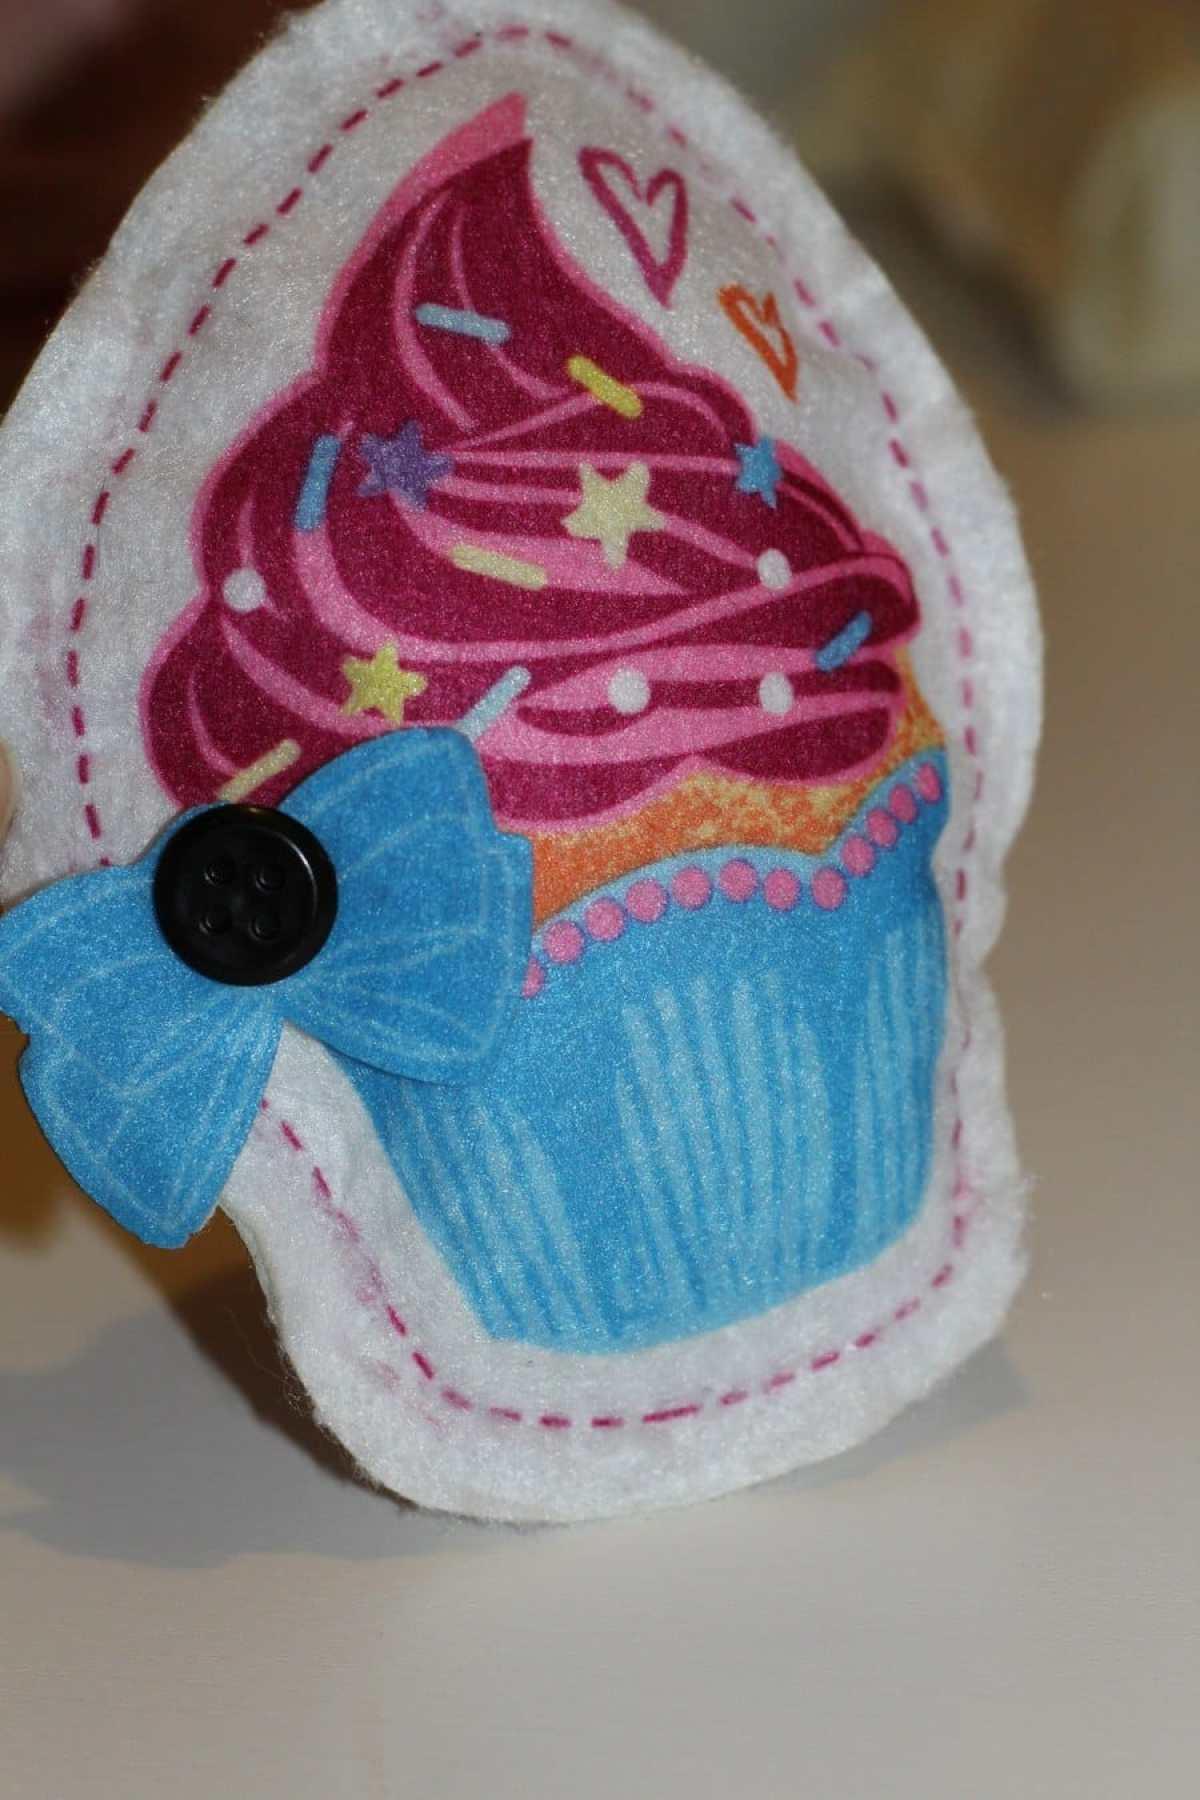 sew cool machine cupcake